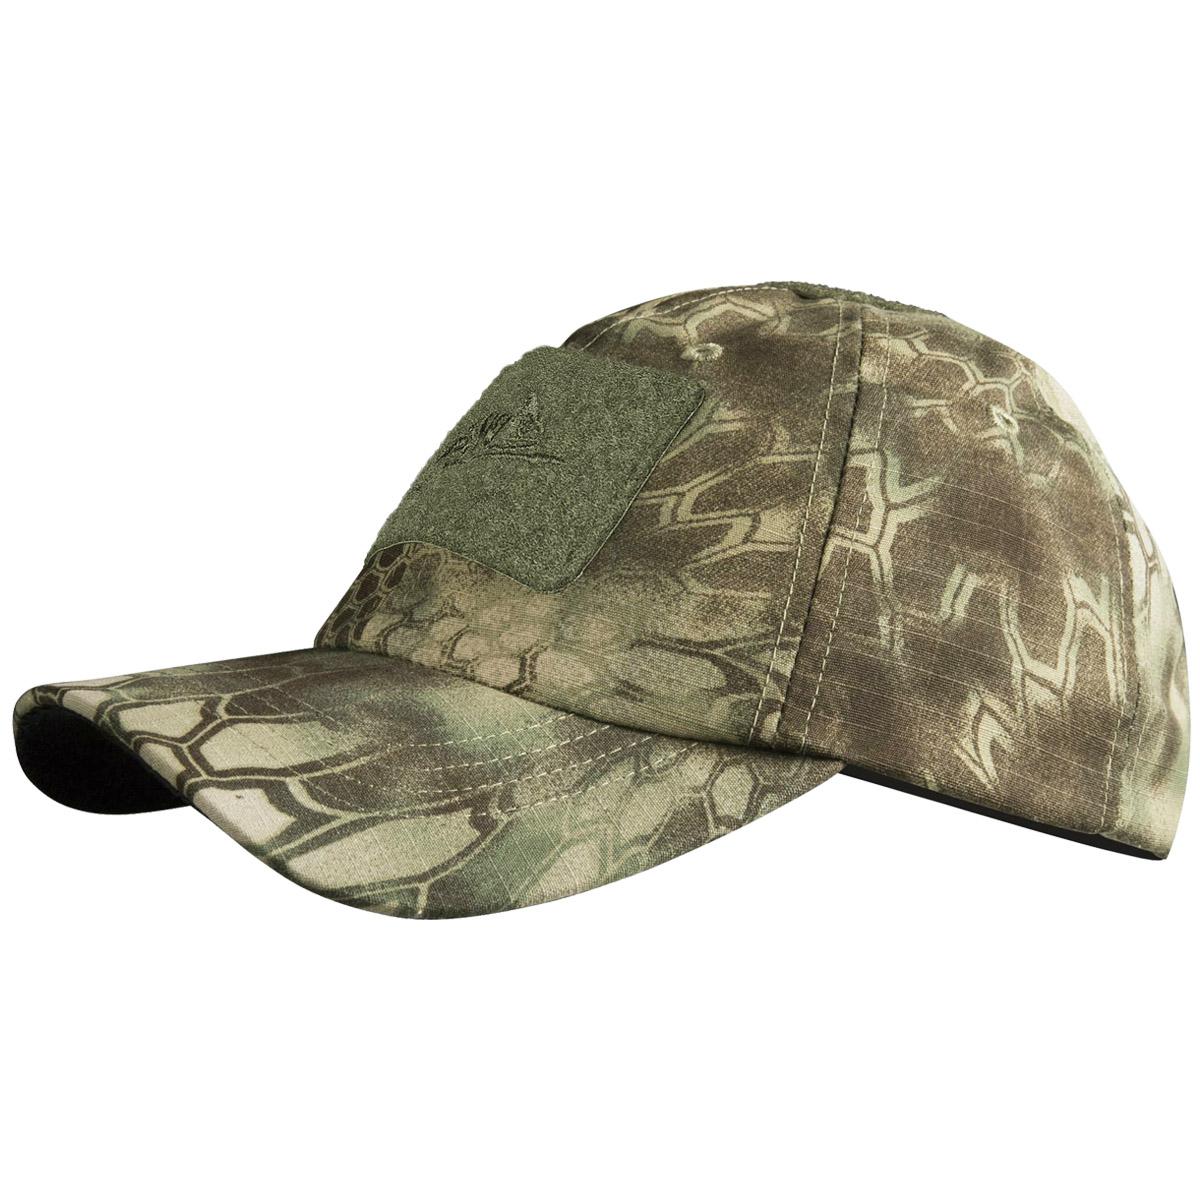 af60cbcb1c8 Details about Helikon Tactical Baseball Cap Military Combat Uniform Hat  Kryptek Mandrake Camo